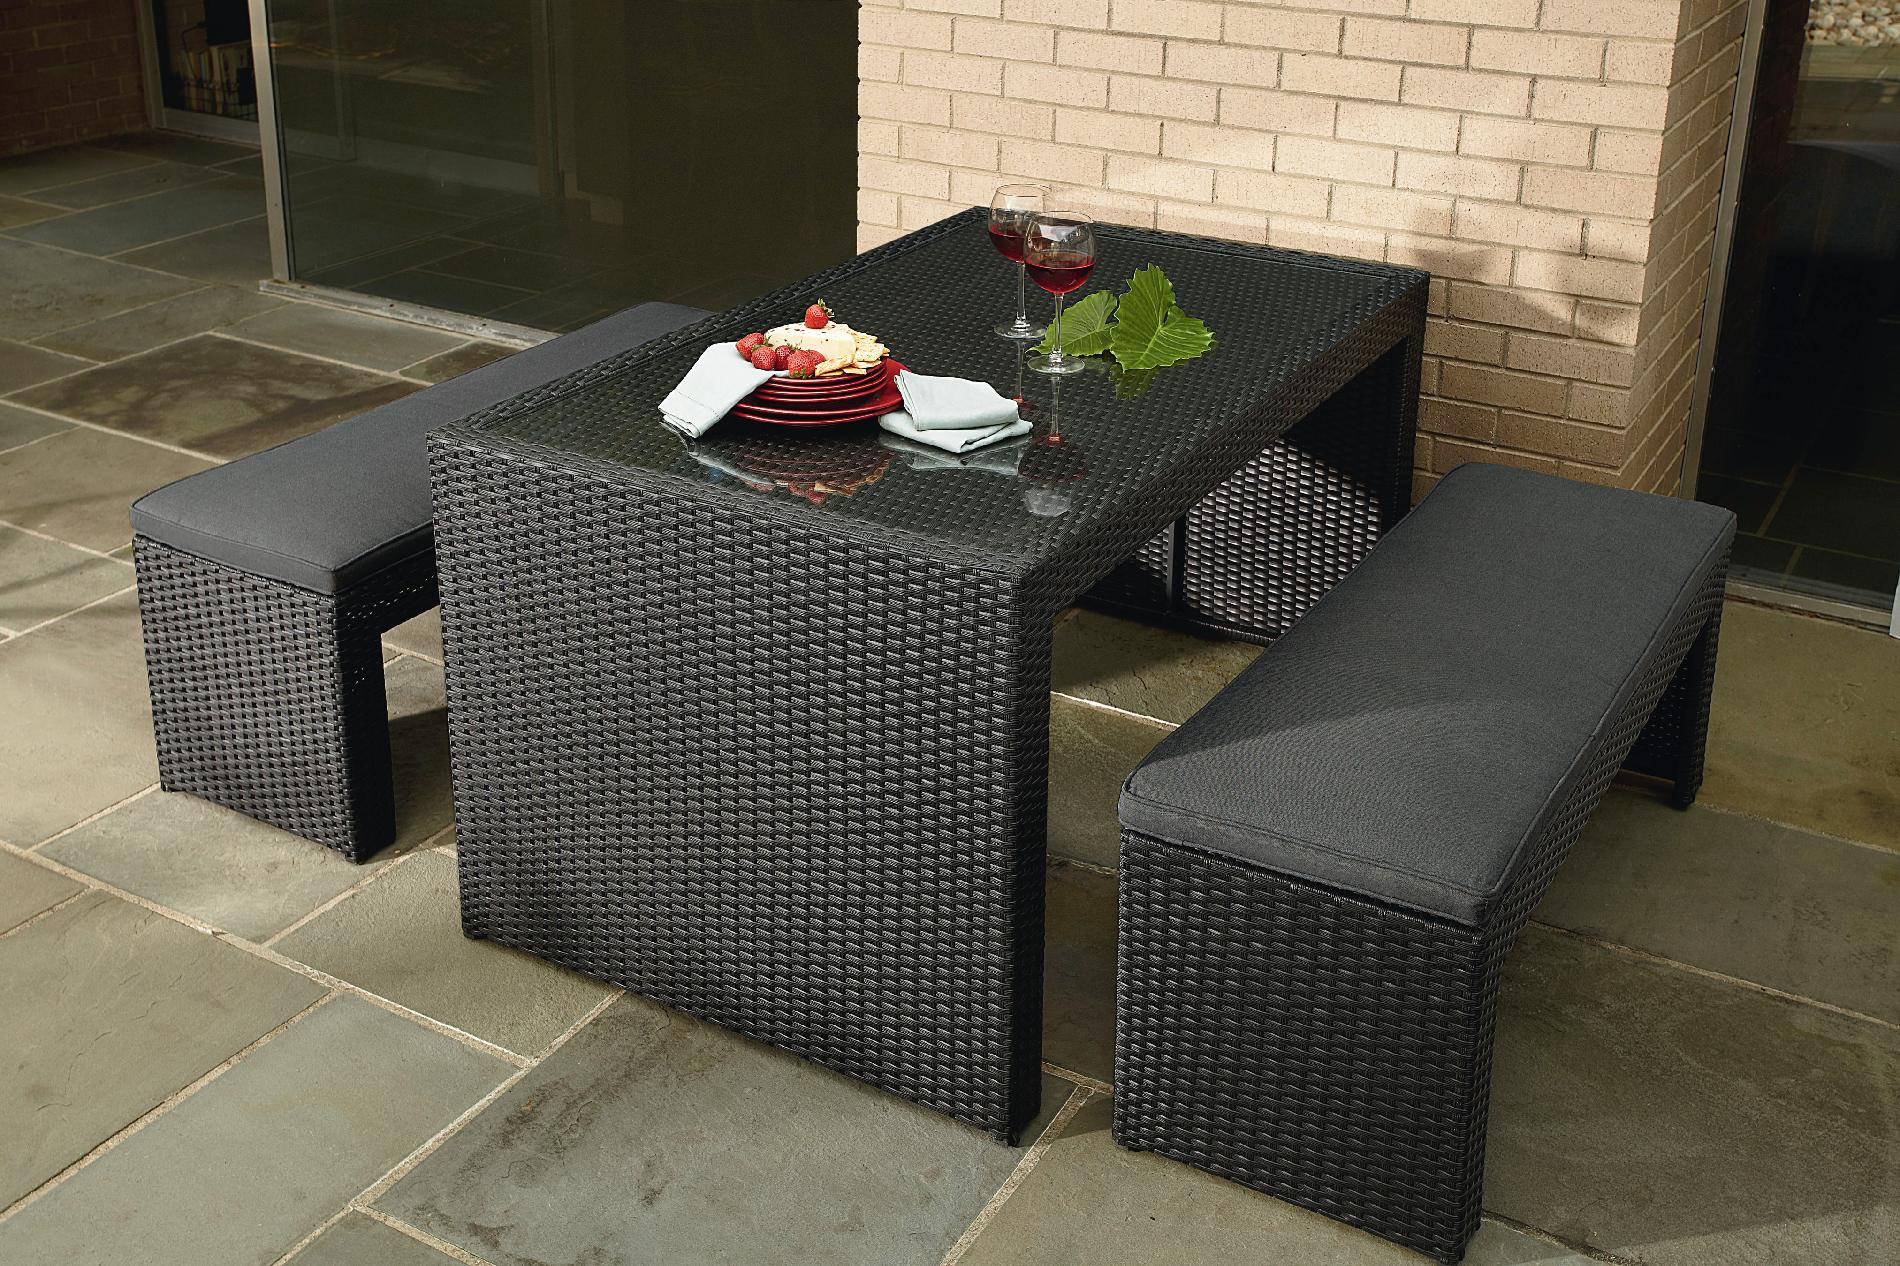 La-boy Derik 3pc Bench Dining Set Limited Availability